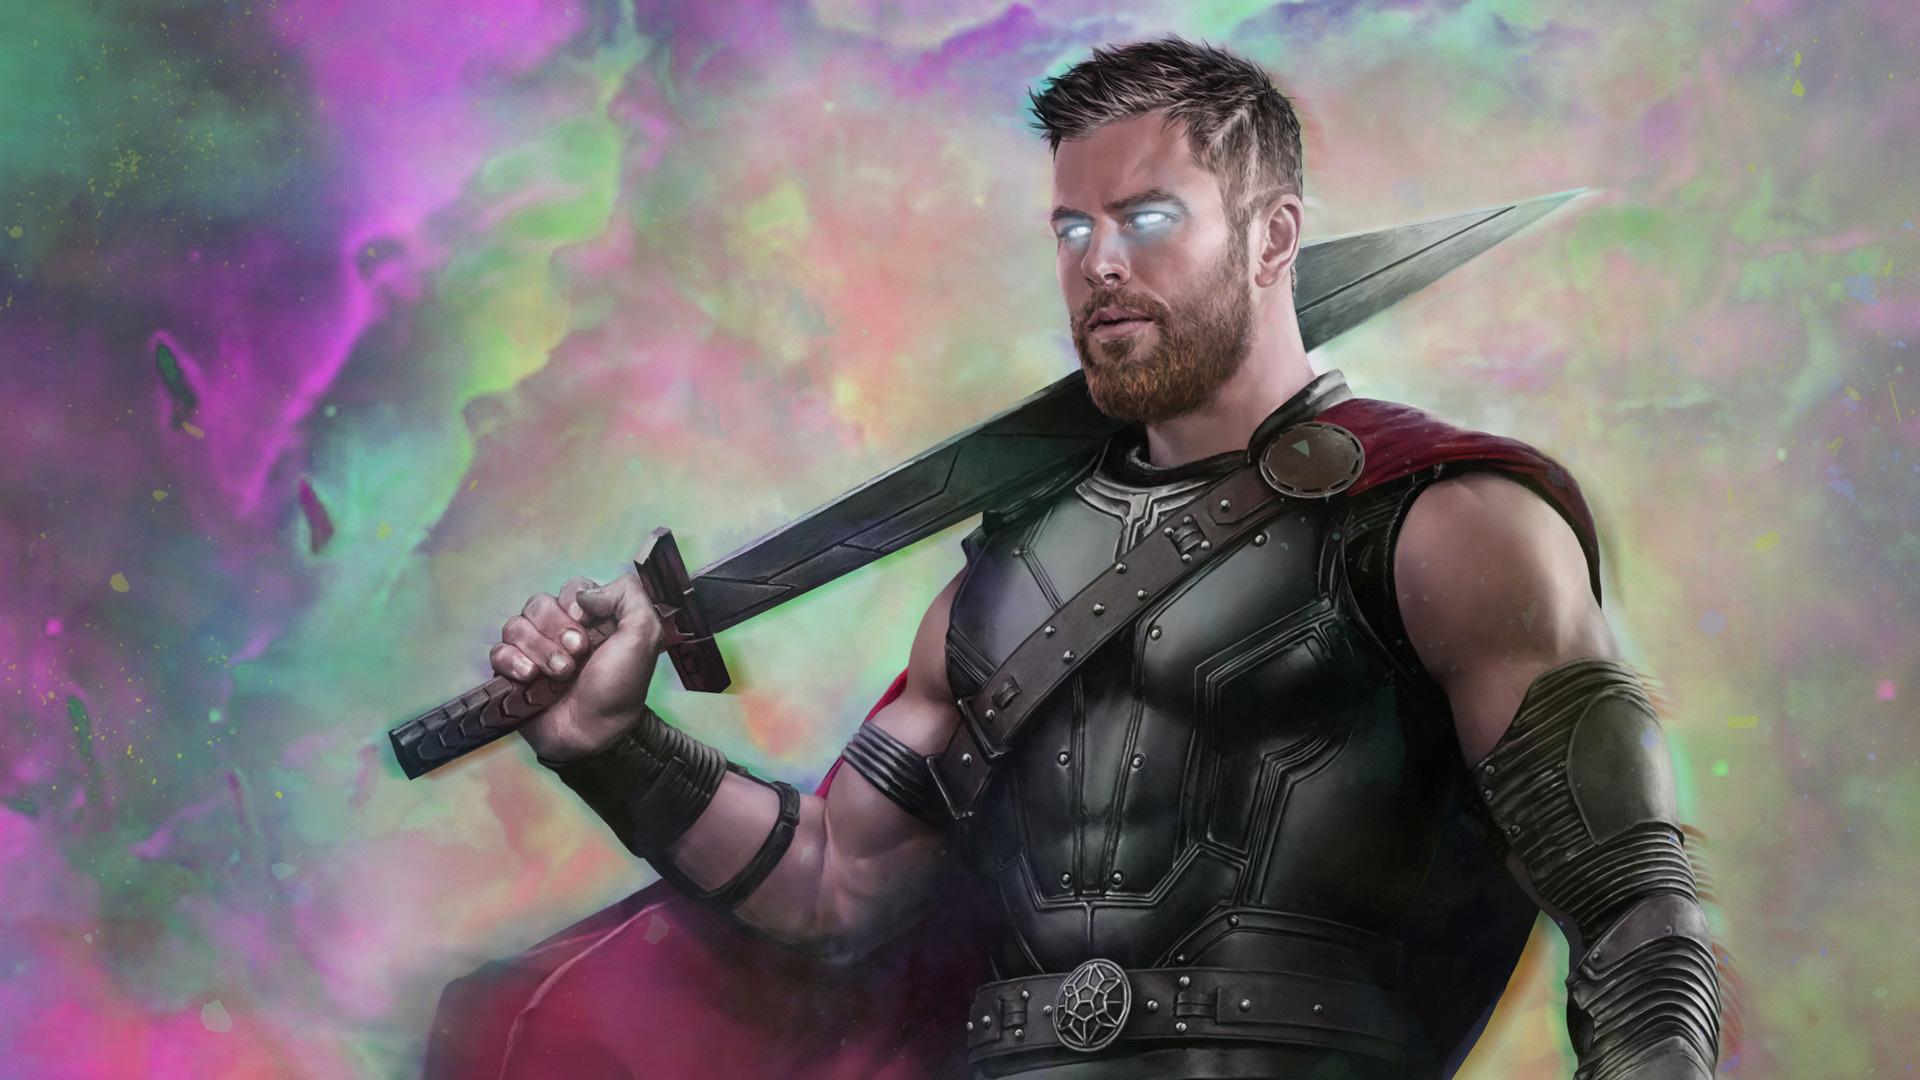 Thor Ragnarok Hd Wallpaper Posted By Samantha Cunningham